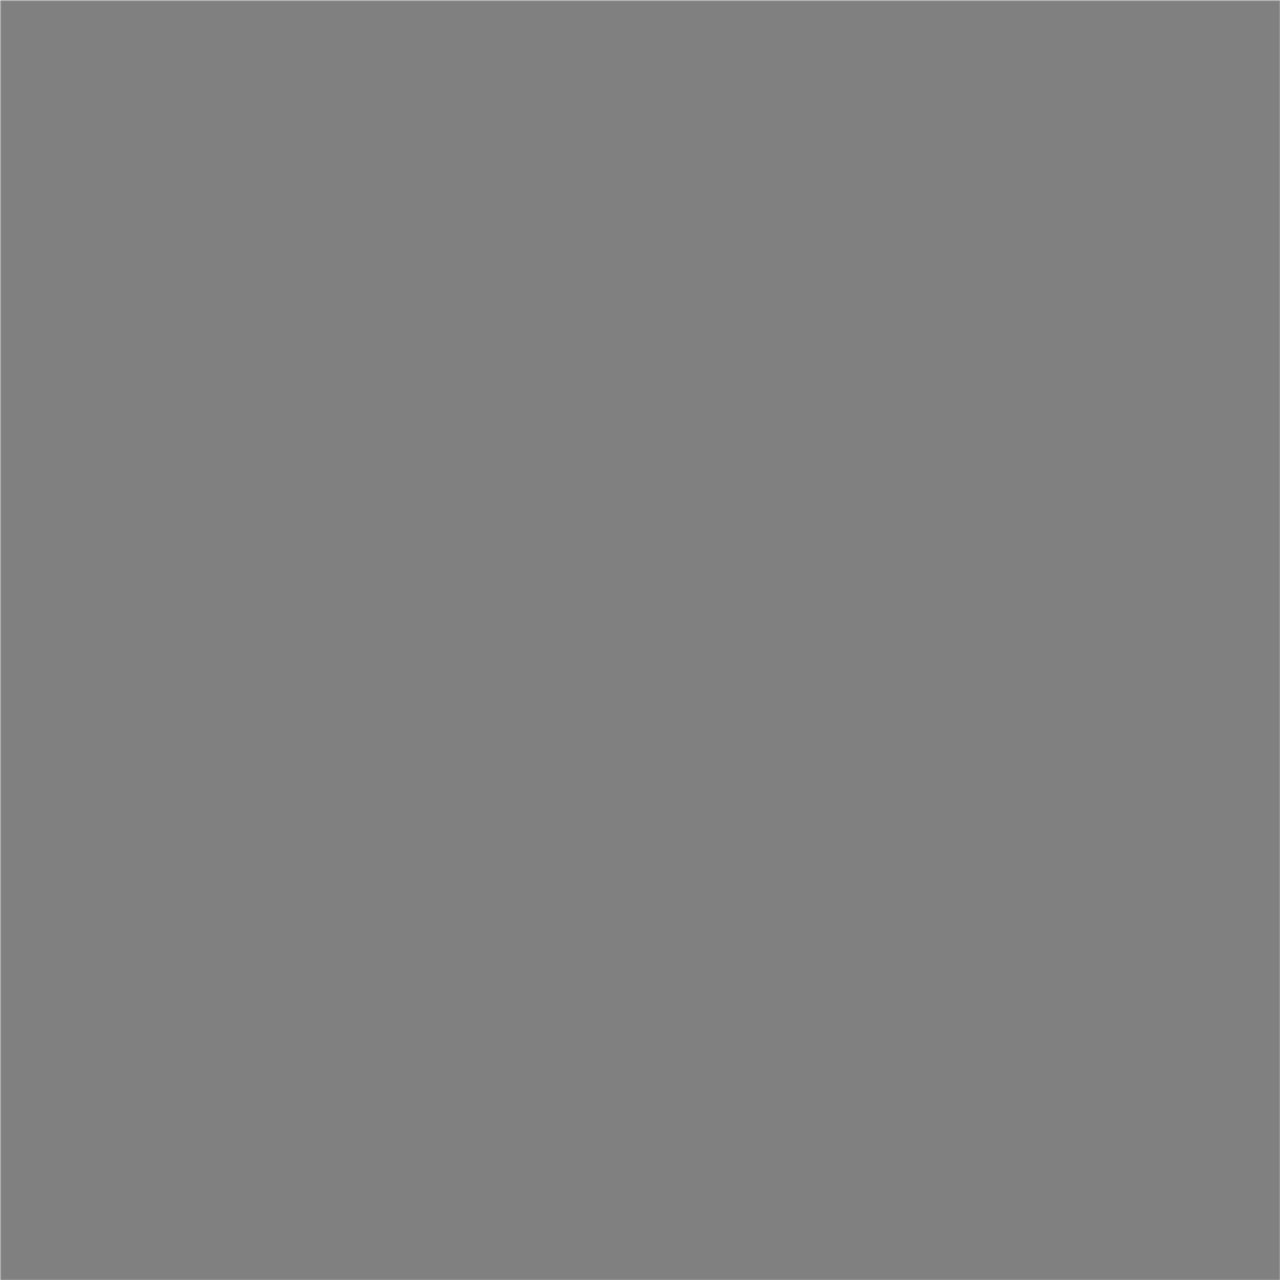 Алюкобонд светло-серый матовый 8811 (3мм/18мкм) 1,22мХ2,44м